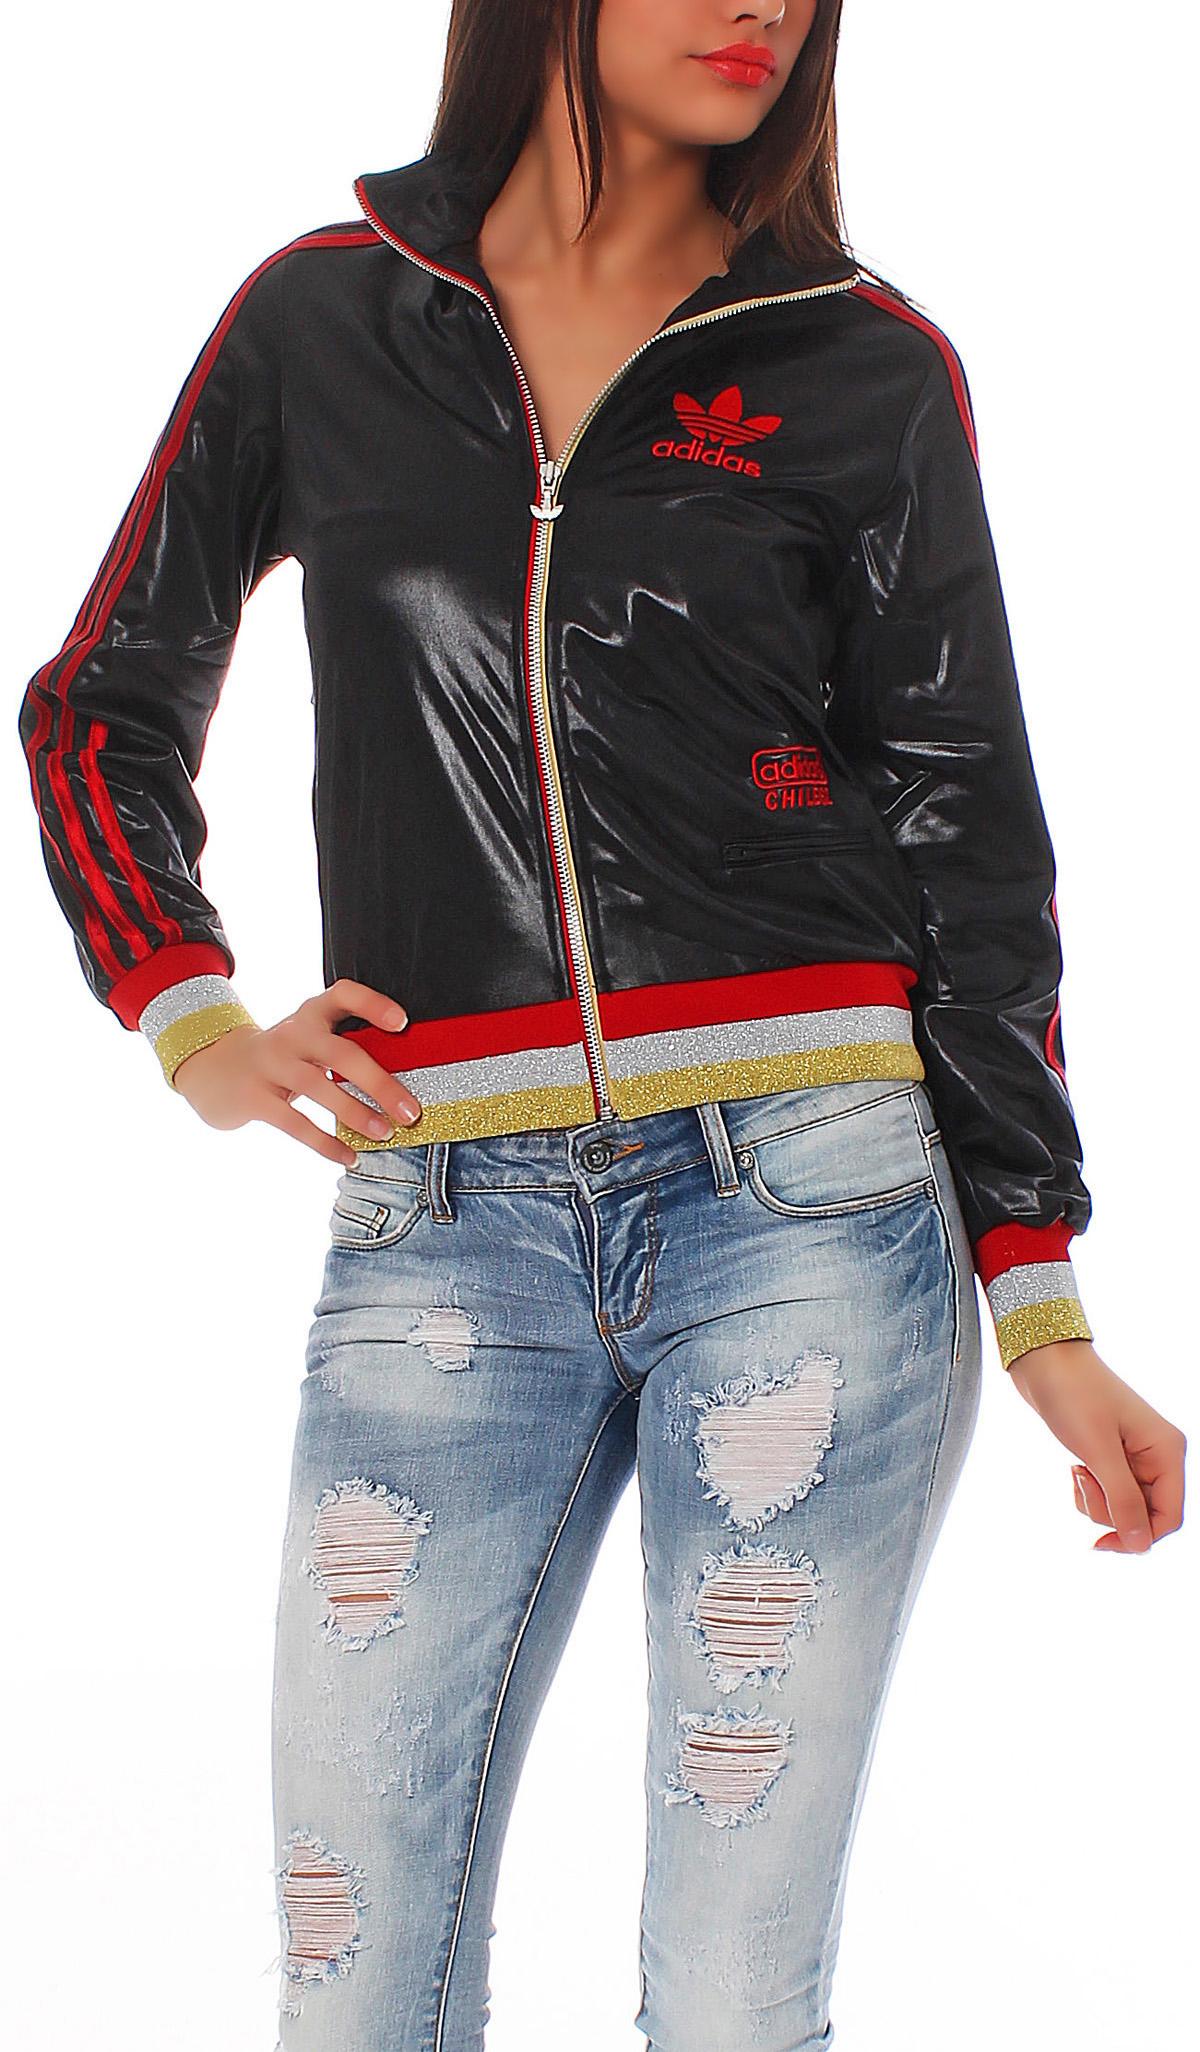 adidas chile 62 rib tt training jacket women 39 s black sweat jacket new. Black Bedroom Furniture Sets. Home Design Ideas